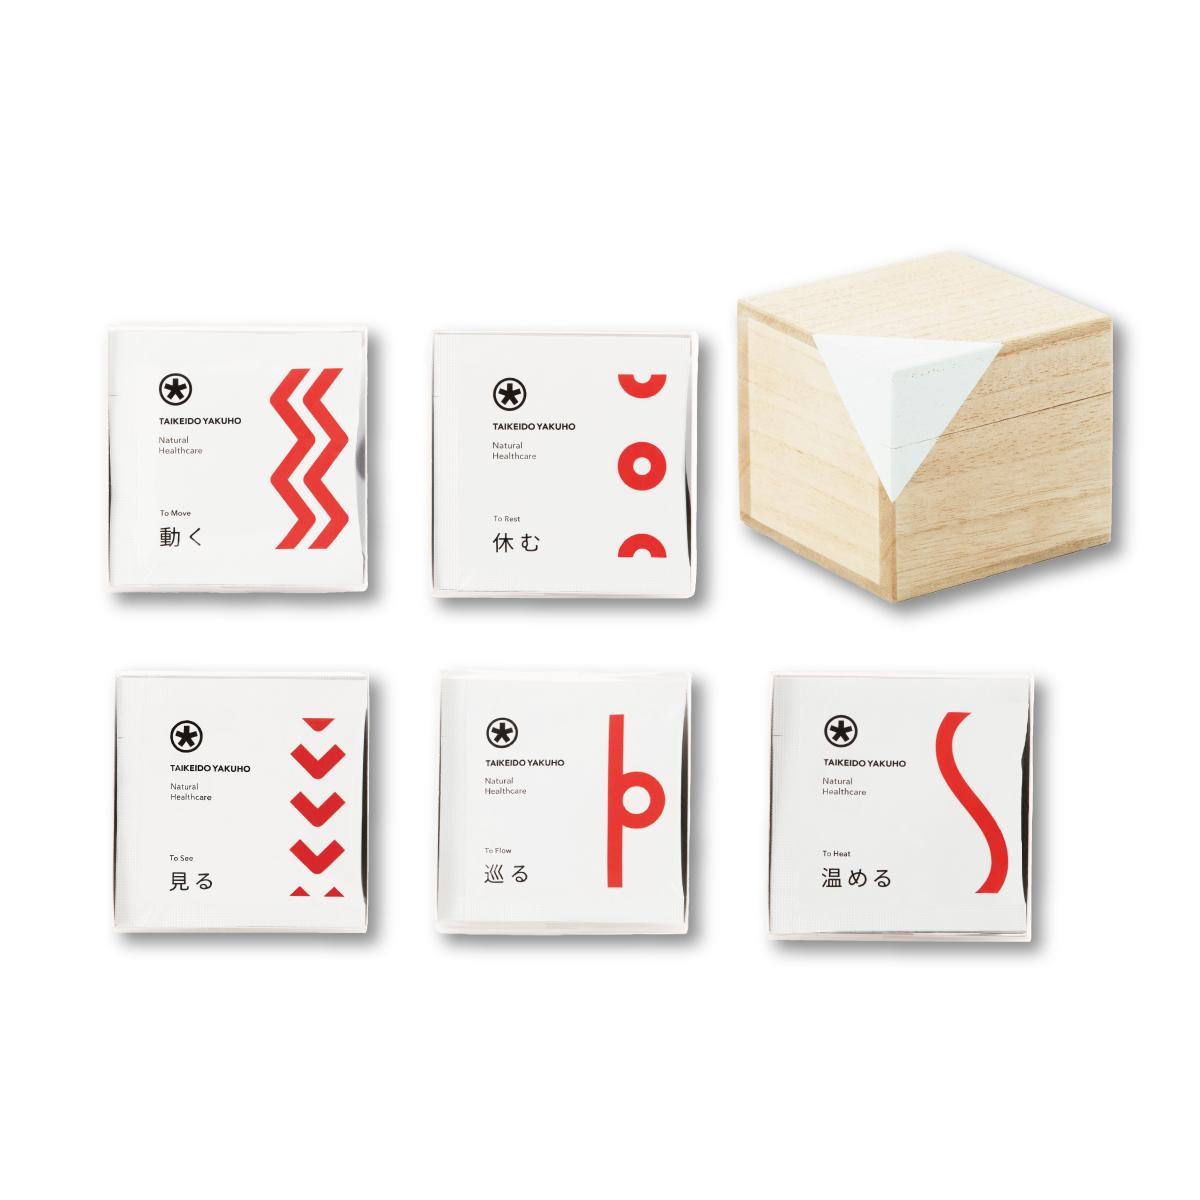 【TAIKEIDO YAKUHO グッドデザイン賞2017受賞サプリメント 】100年余年の長きに渡る研究や経験、知識を現代のライフスタイルに最適化し導き出した5種のラインナップ。